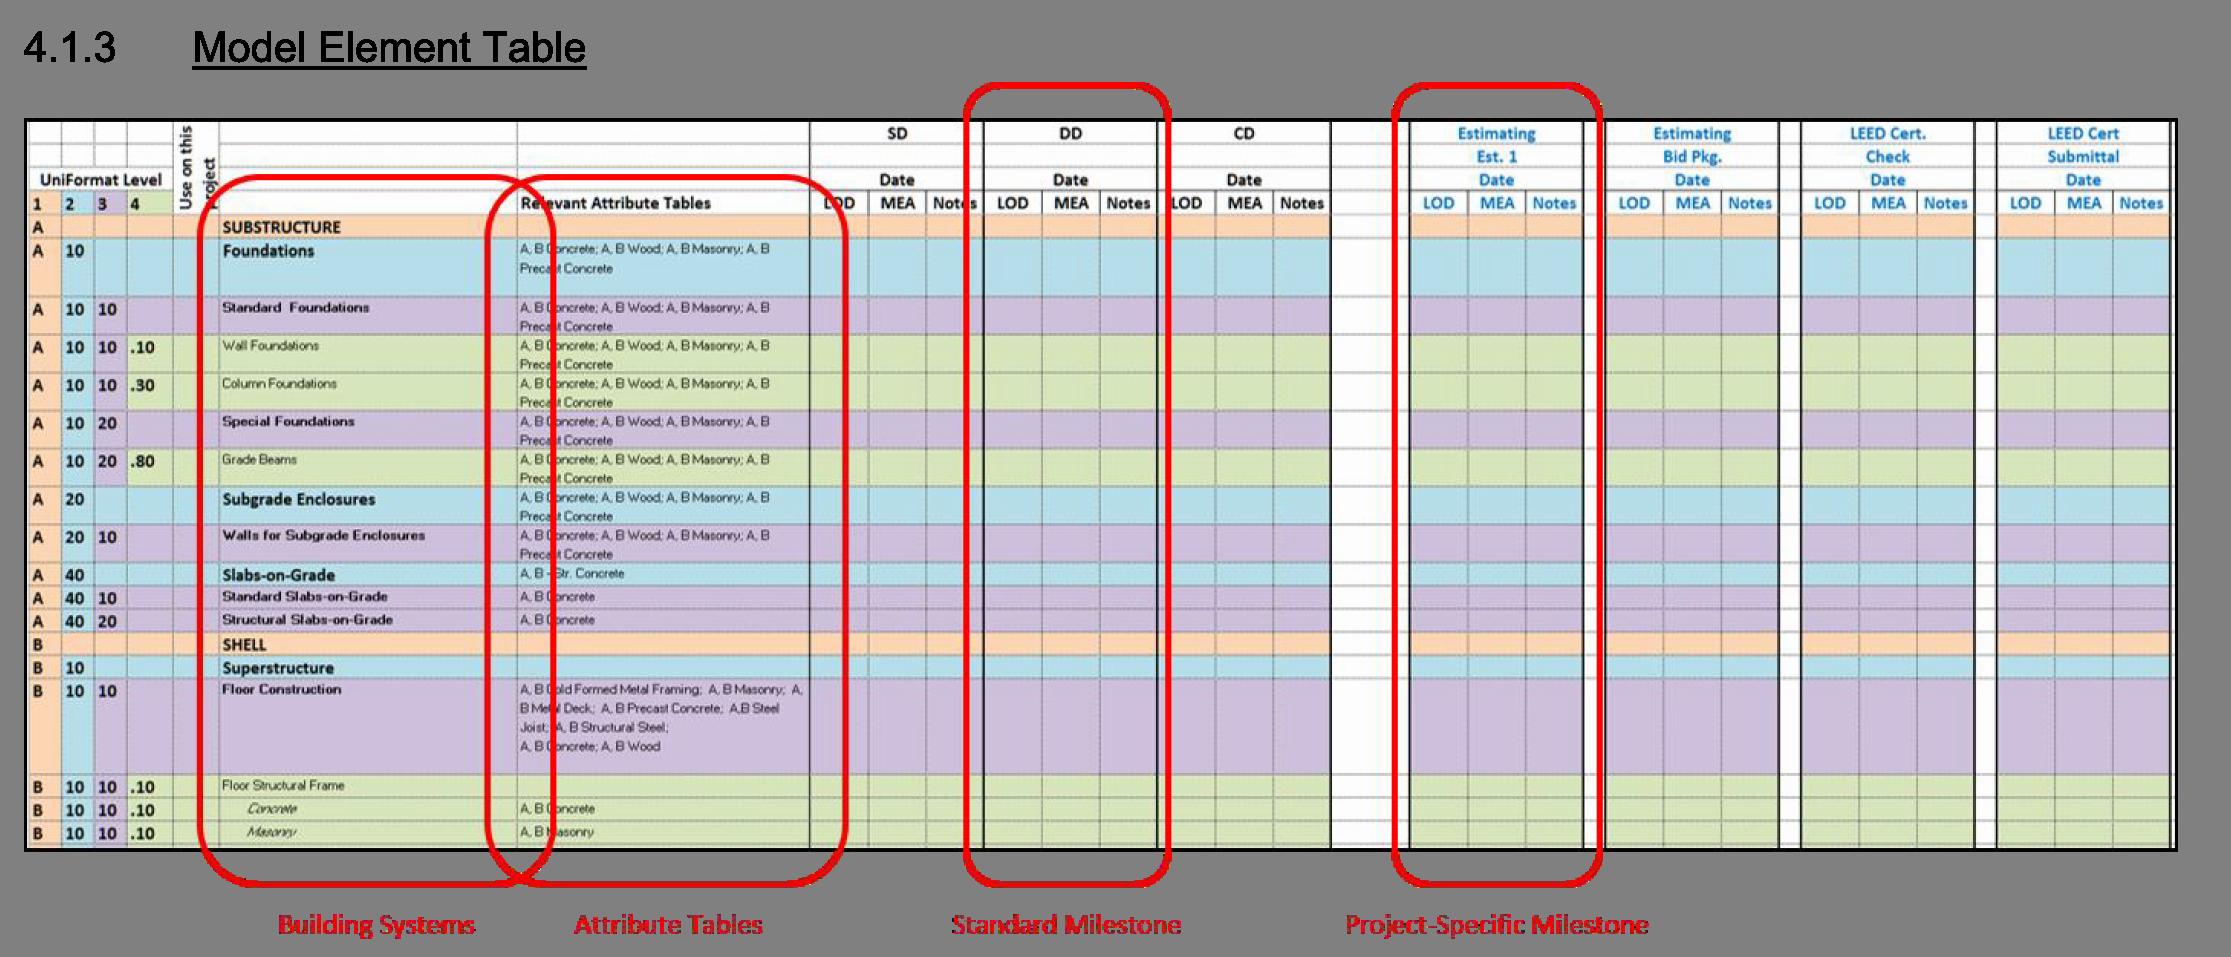 Model Element Table